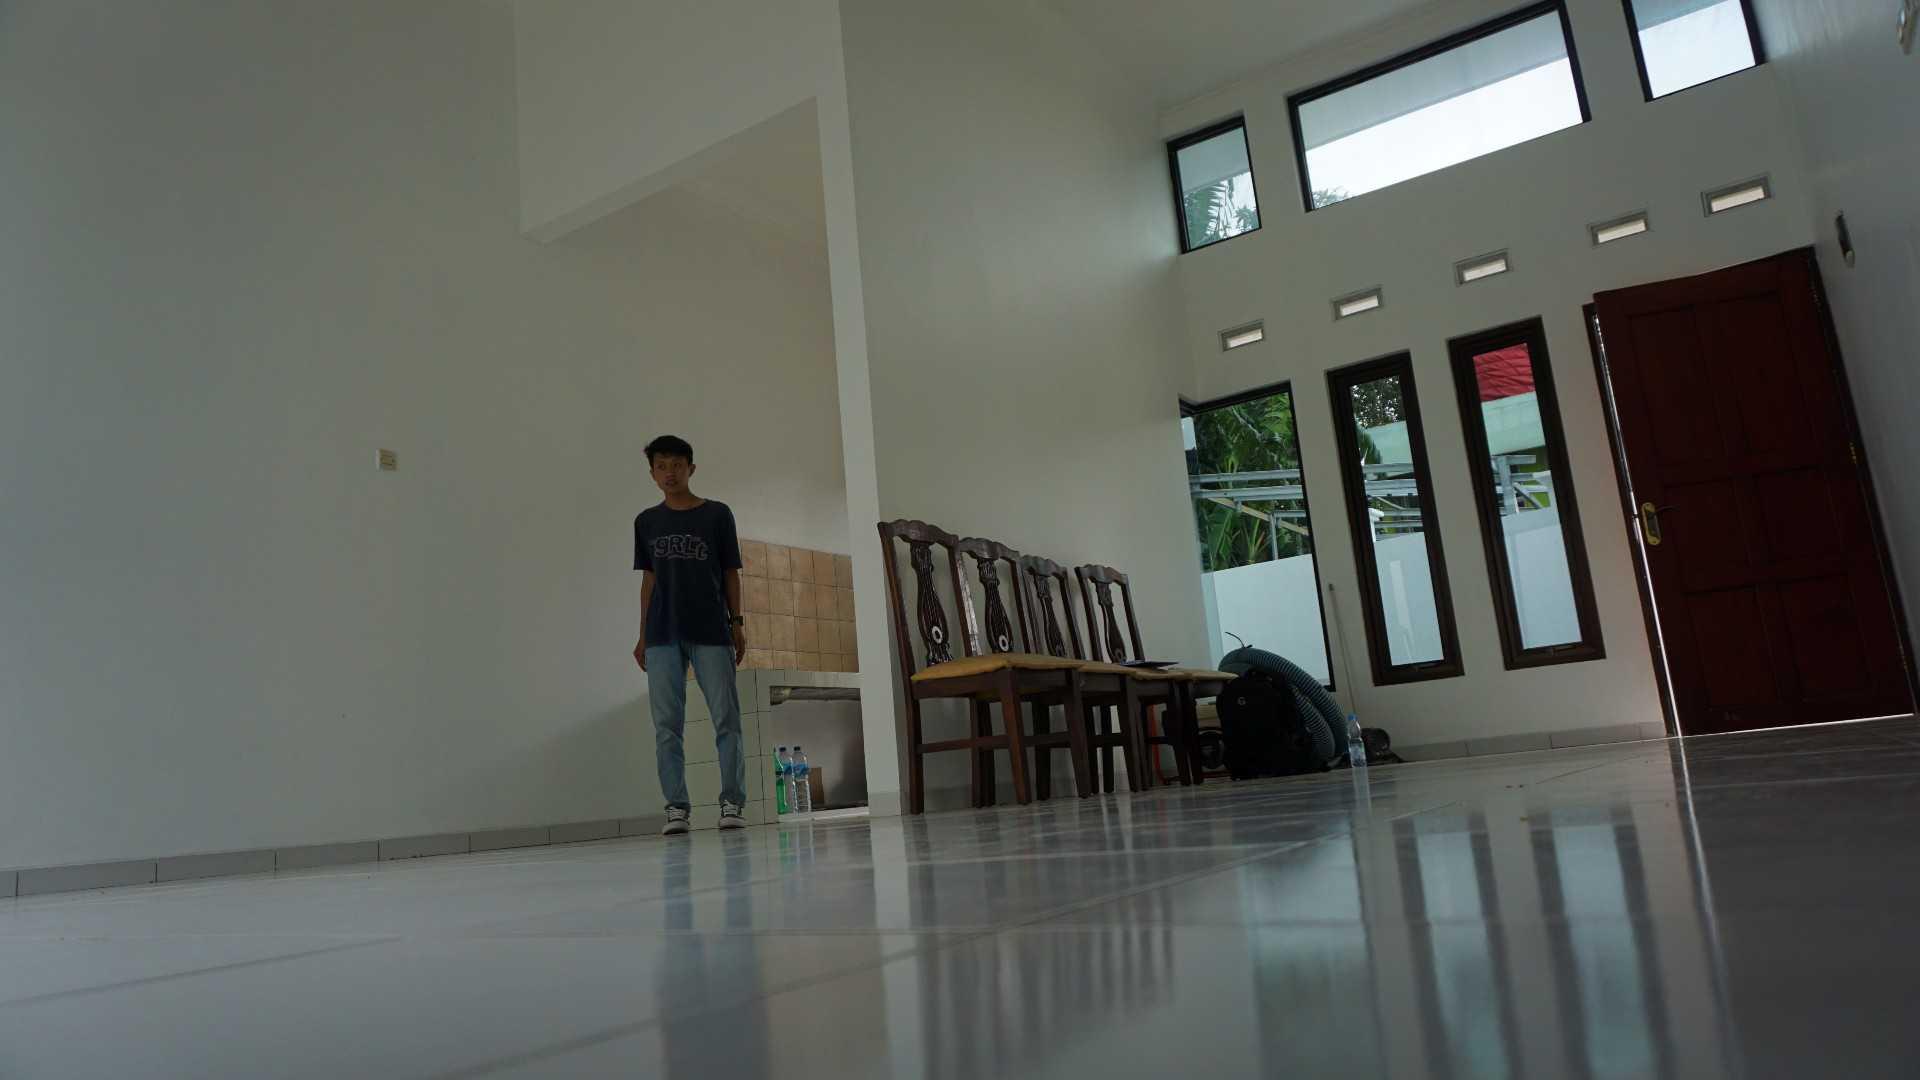 Rekoo Indonesia Renovasi Rumah Tinggal Tlogosari Semarang Semarang, Kota Semarang, Jawa Tengah, Indonesia Semarang, Kota Semarang, Jawa Tengah, Indonesia Rekoo-Indonesia-Renovasi-Rumah-Tinggal-Tlogosari-Semarang  125080